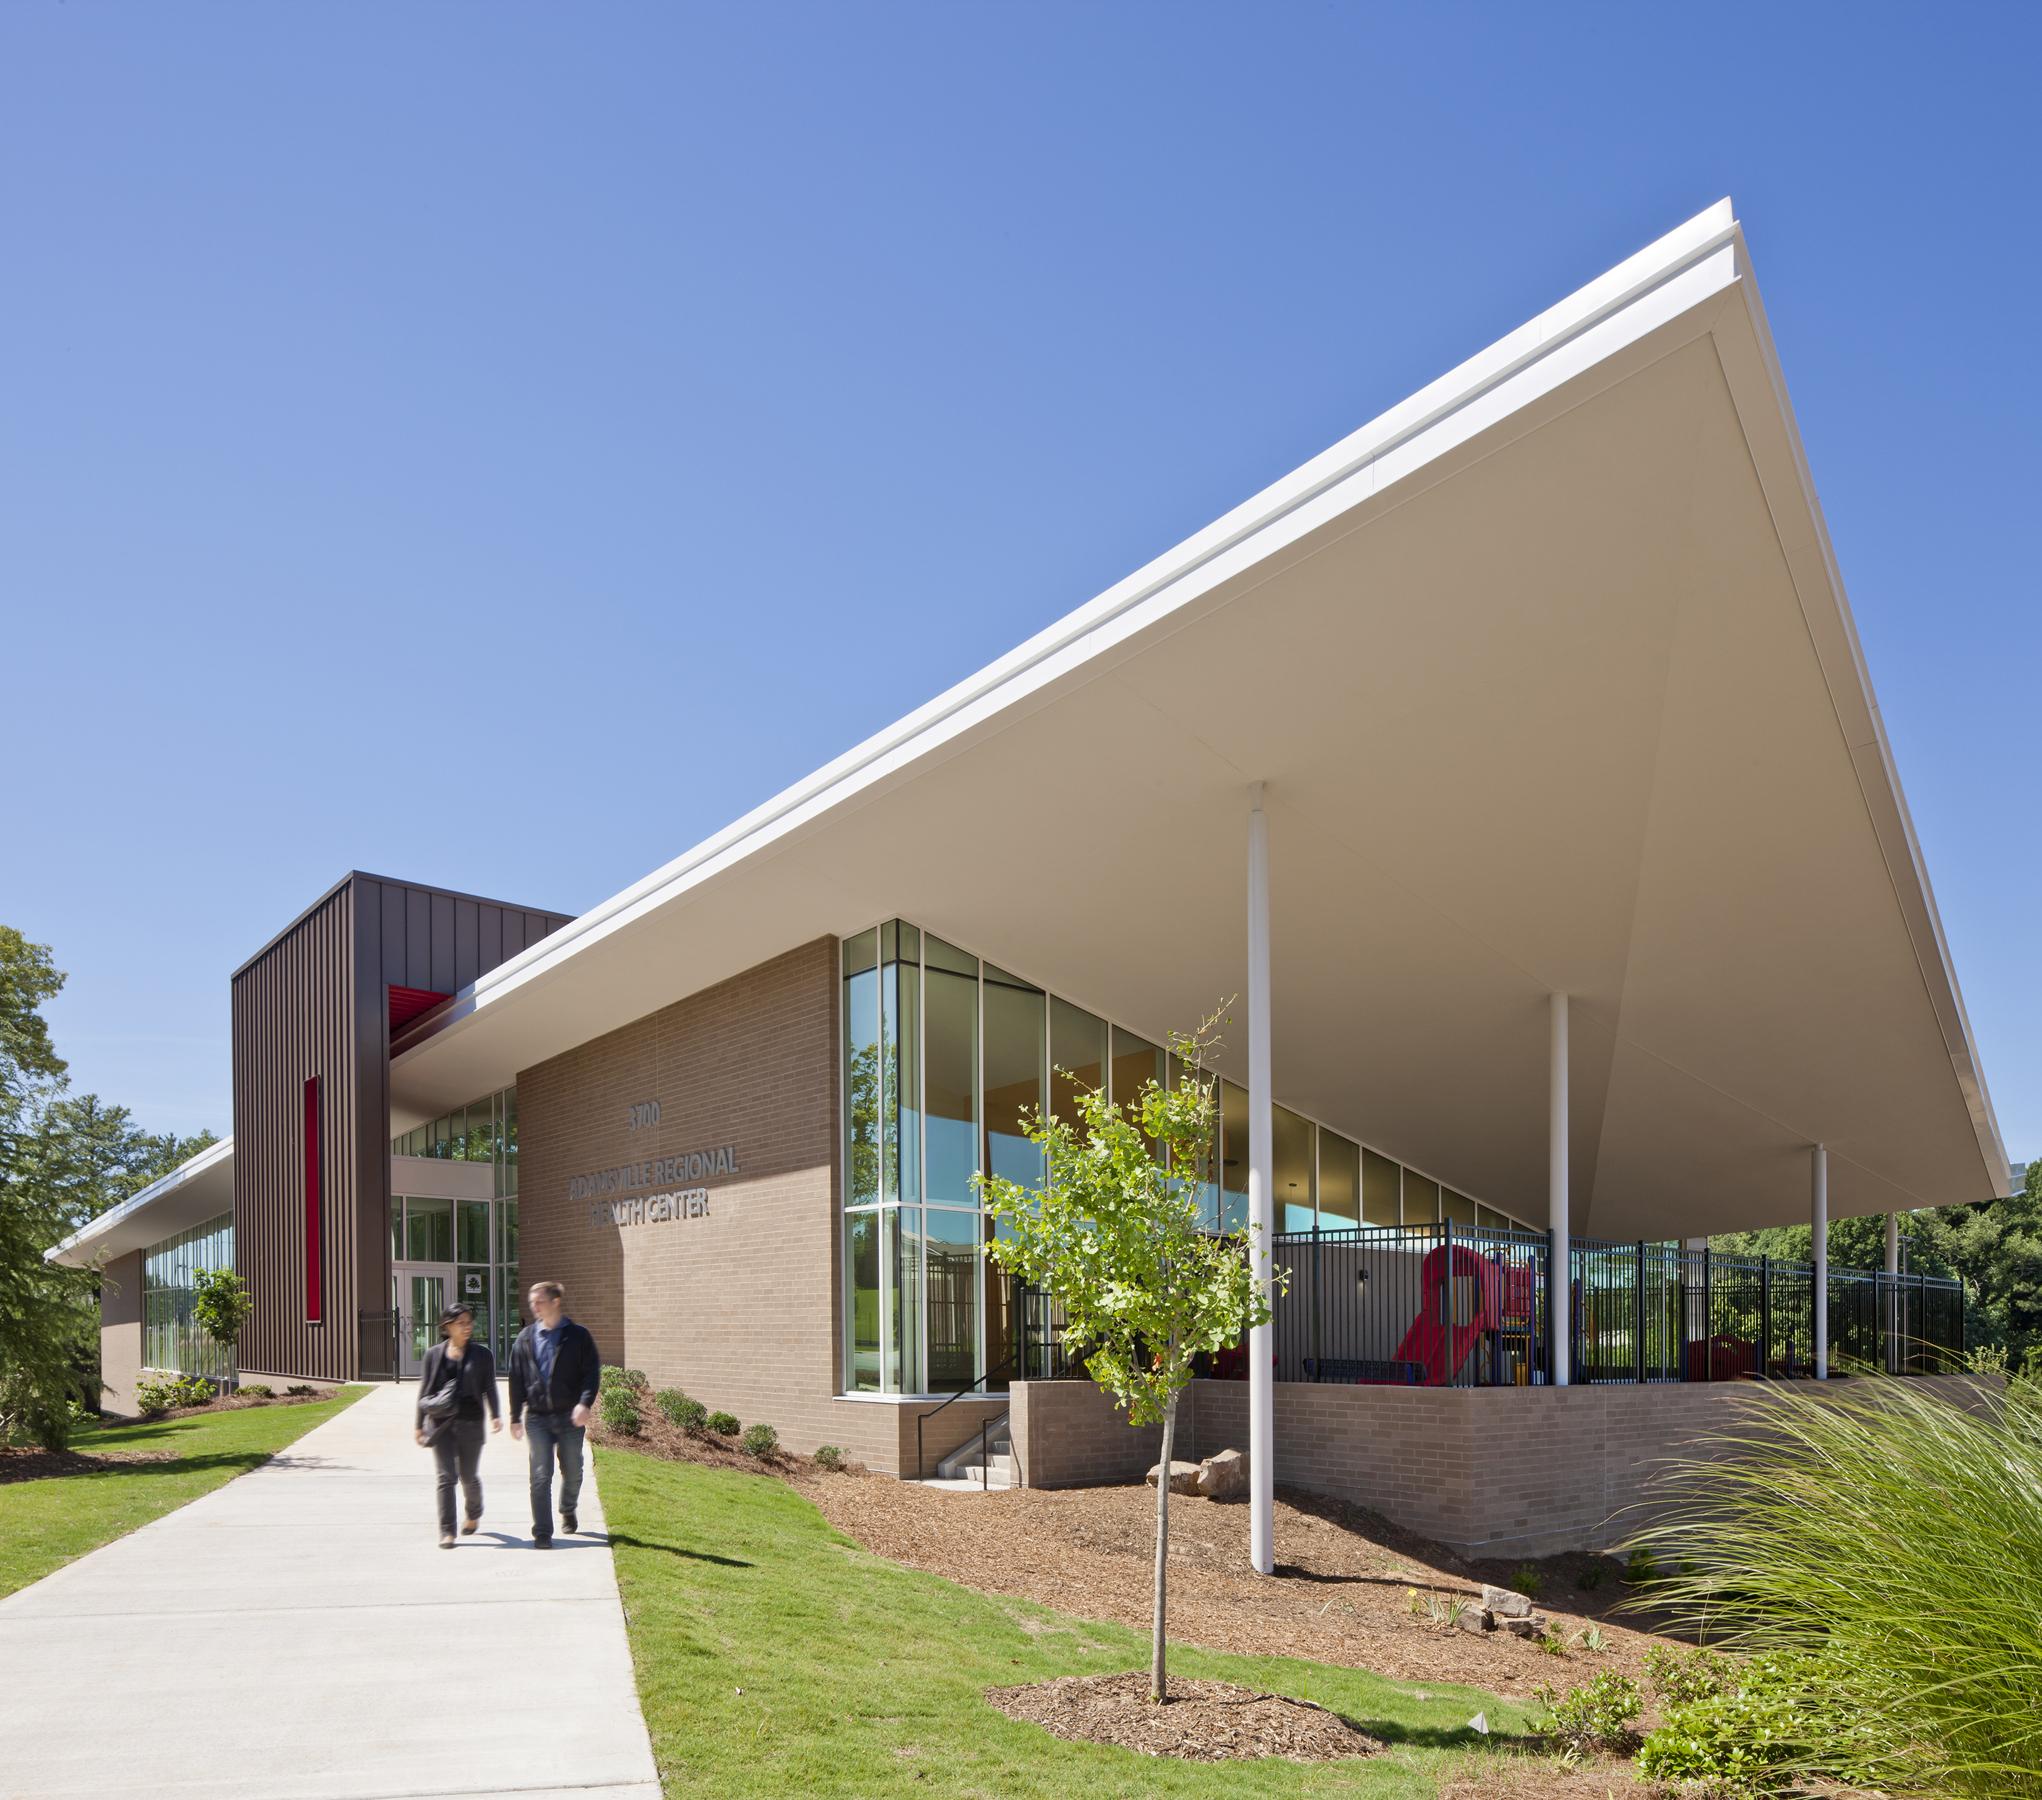 Top 90 Healthcare Architecture Firms Building Design: Adamsville Regional Health Center